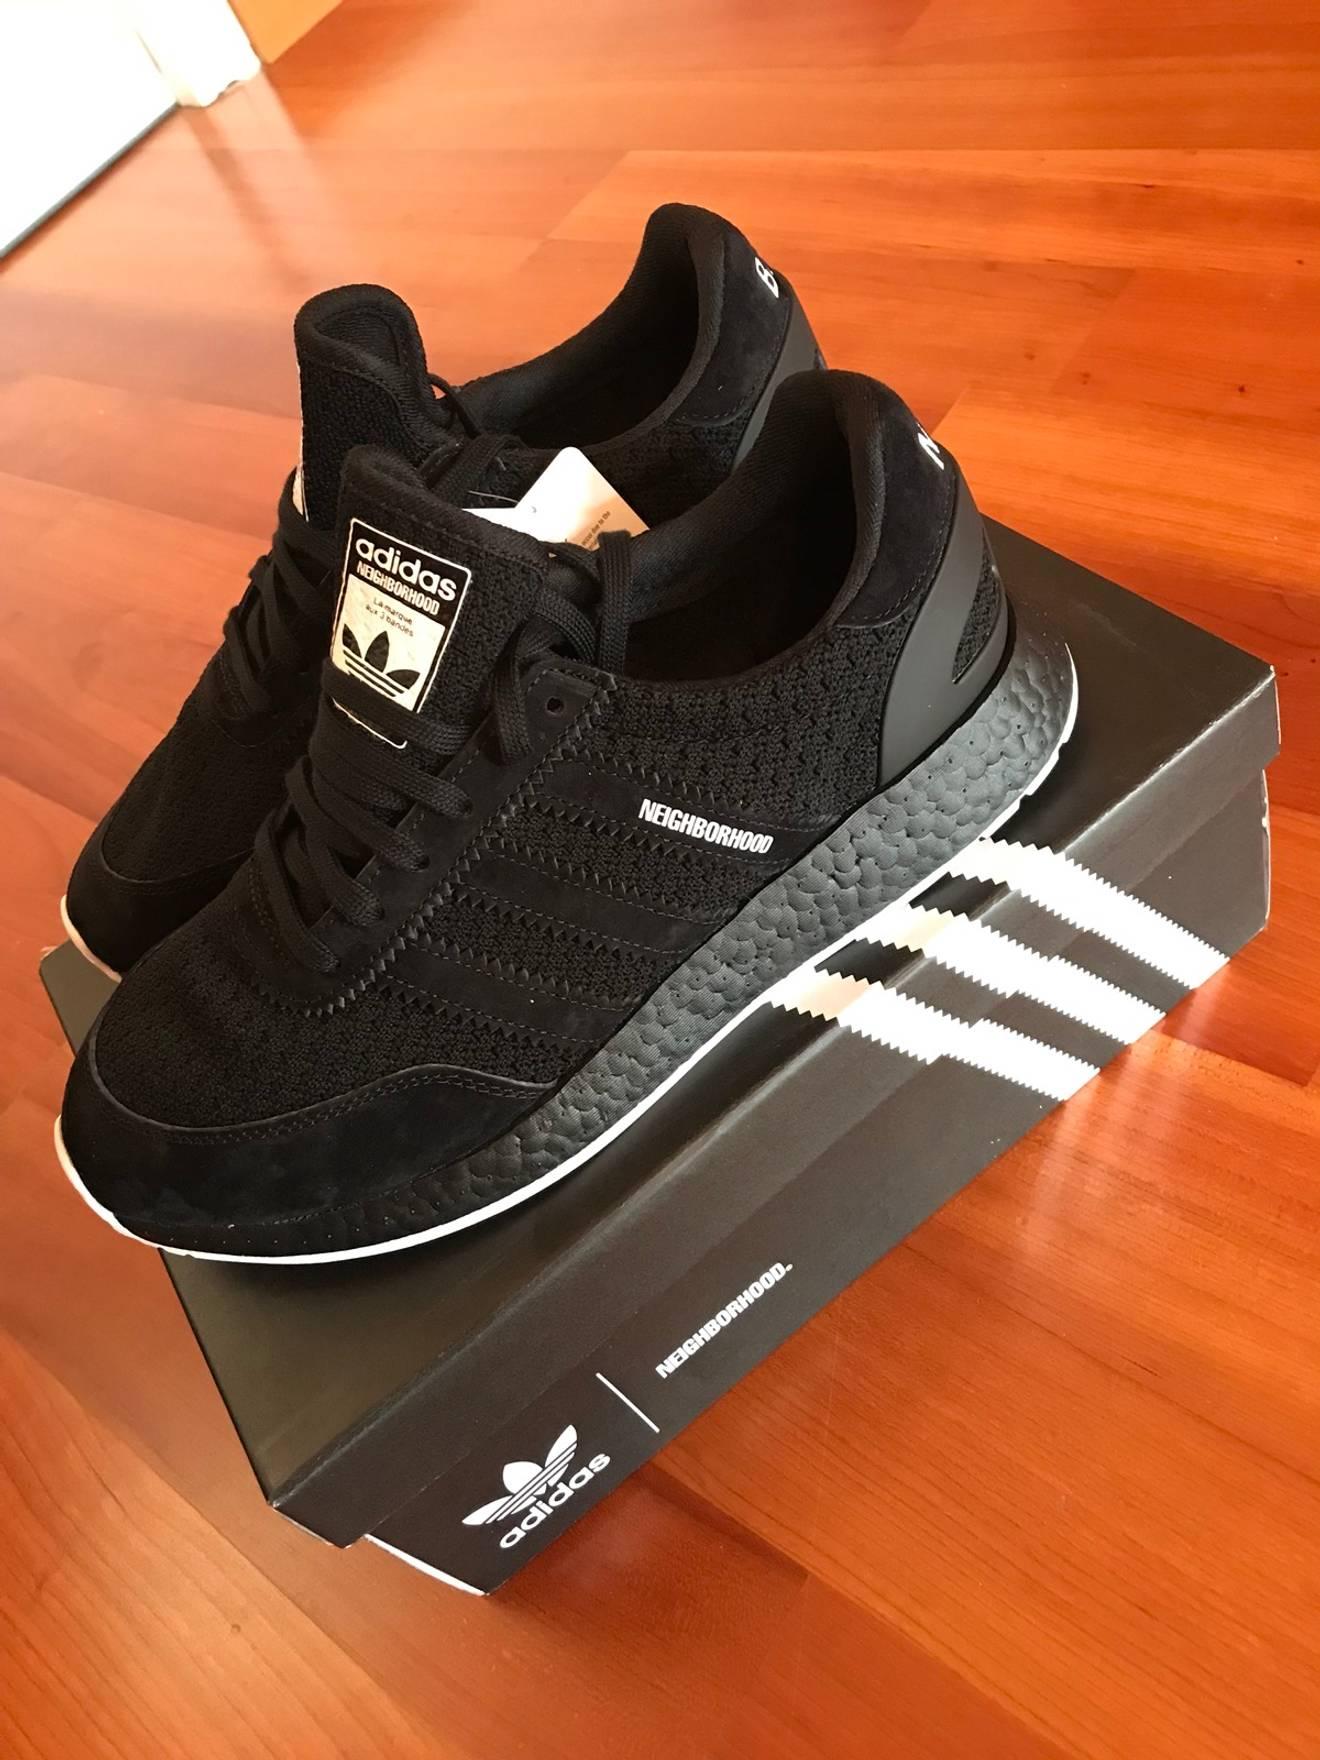 premium selection ed36a 0e6e2 Adidas Adidas X Neighborhood Iniki Consortium Size 9.5 - Low ...